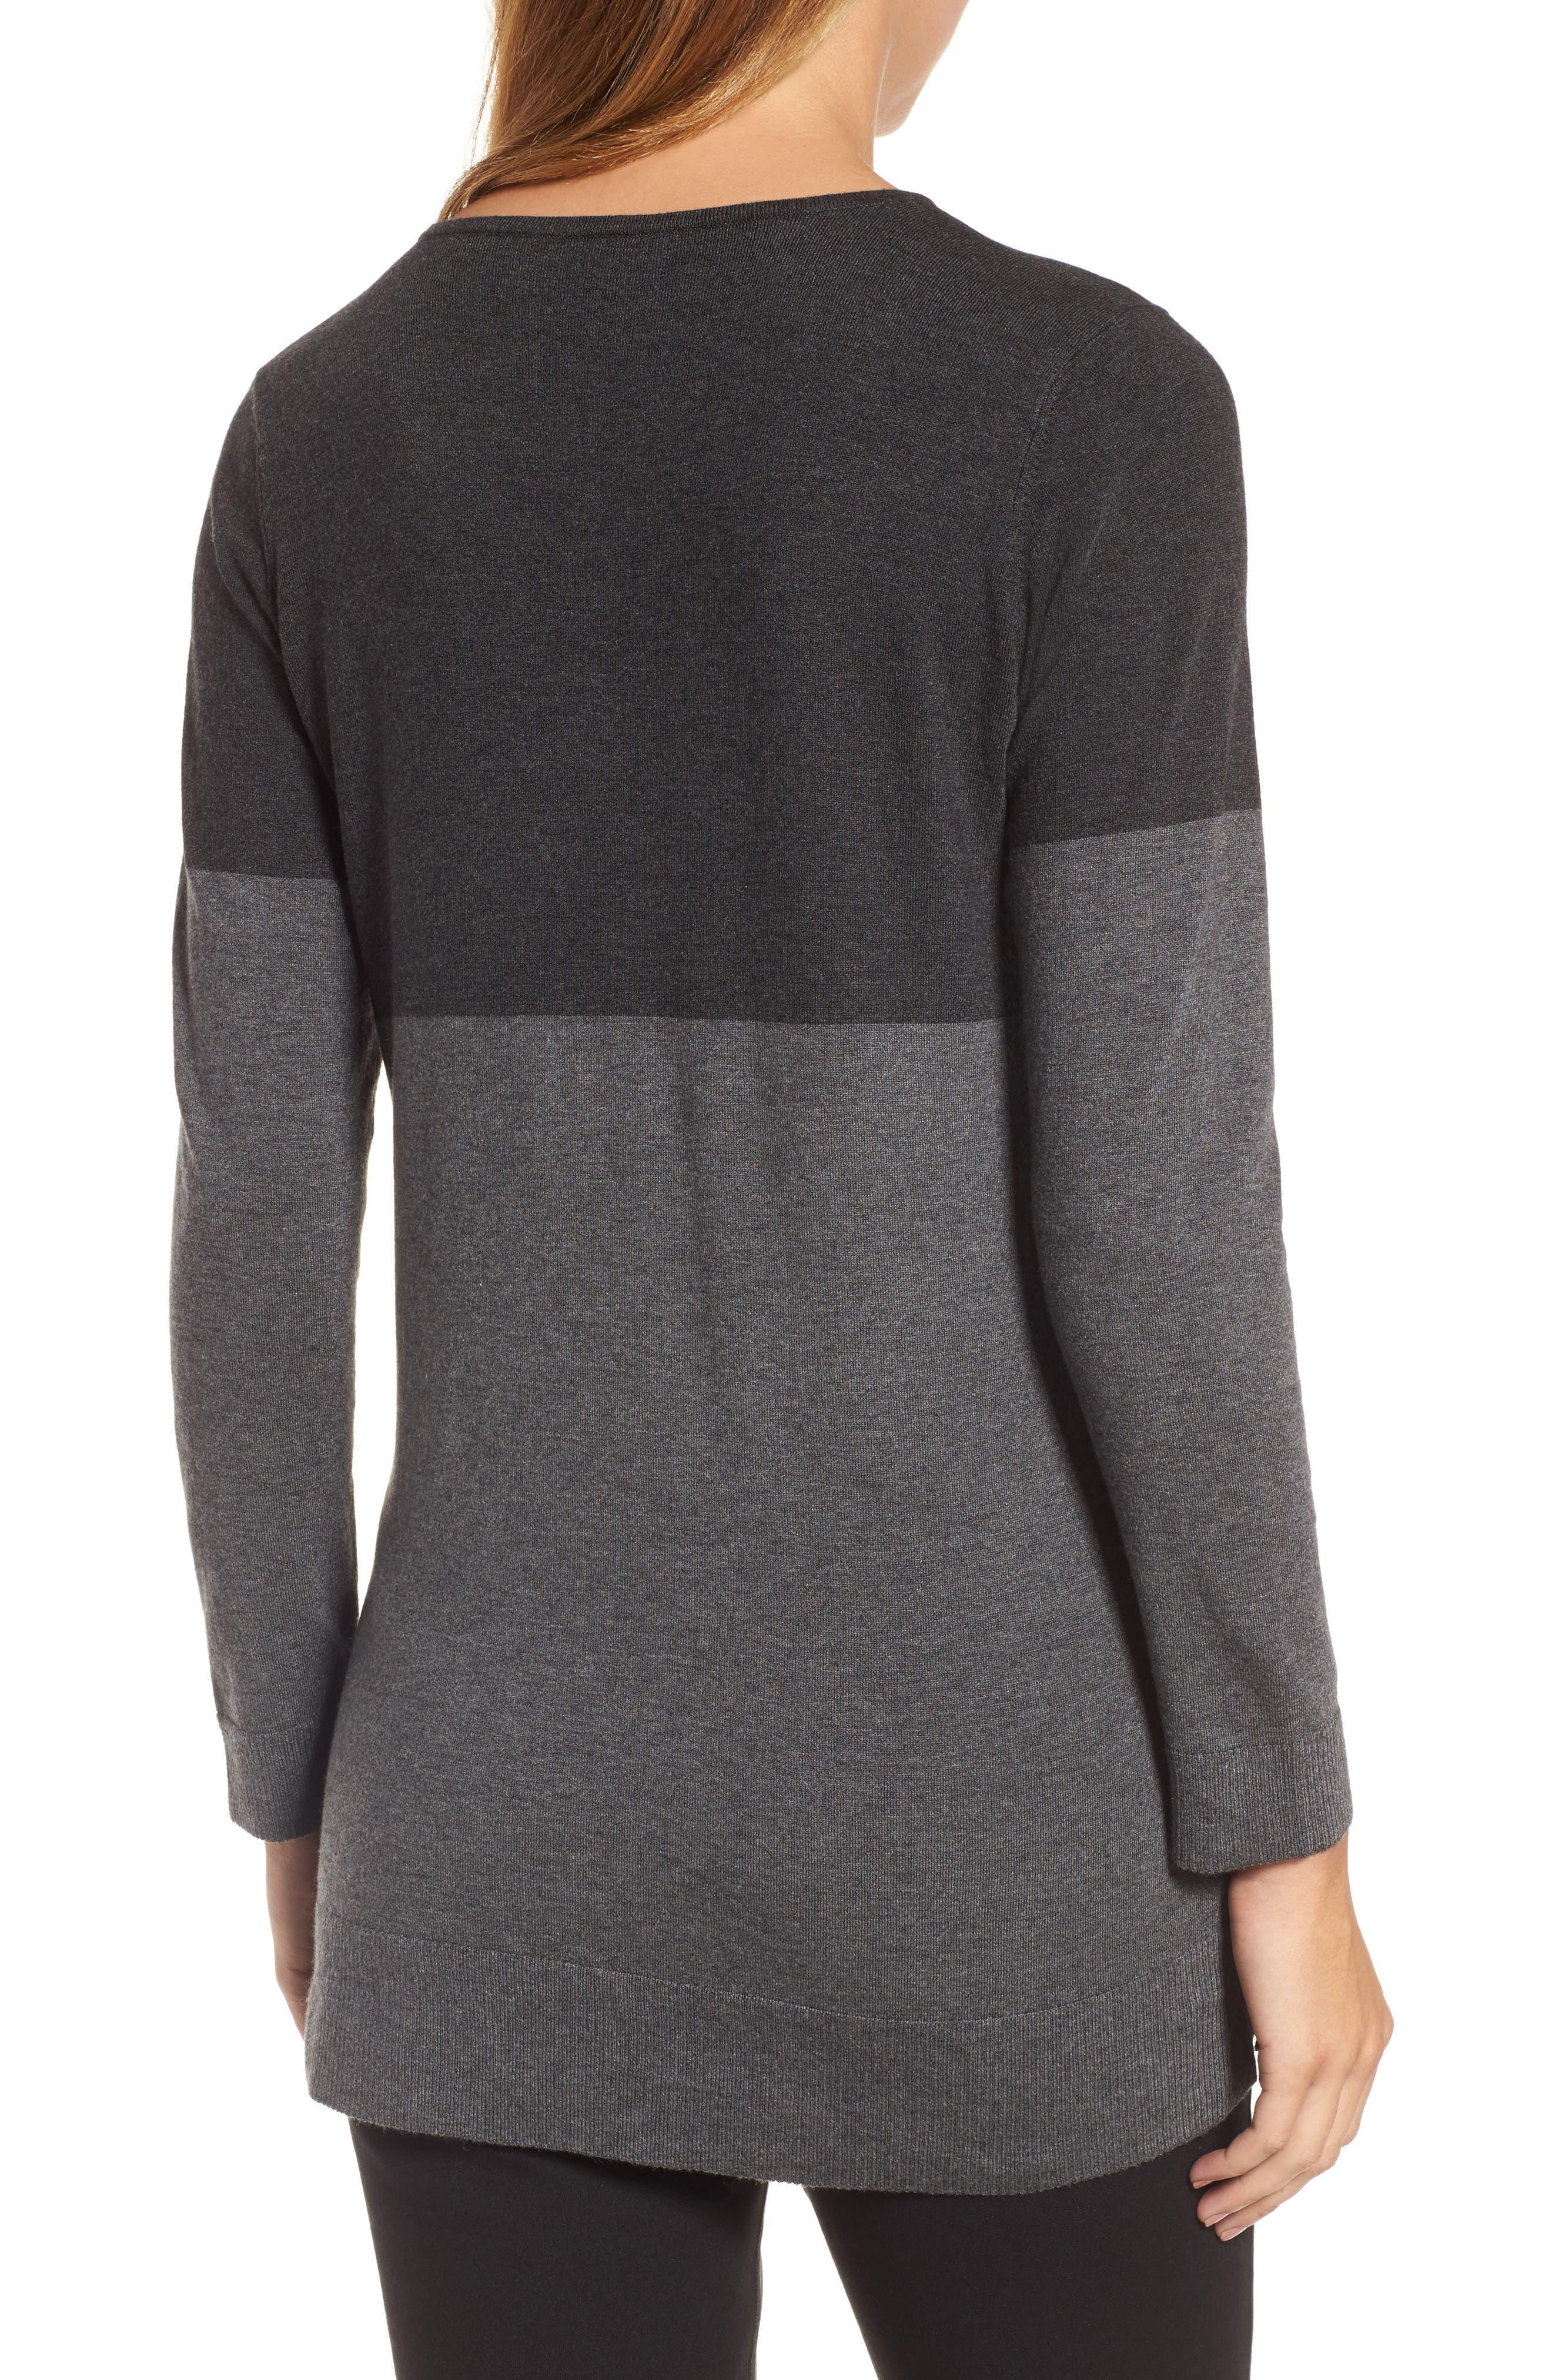 Colorblock Tencel<sup>®</sup> Blend Sweater,                             Alternate thumbnail 2, color,                             064